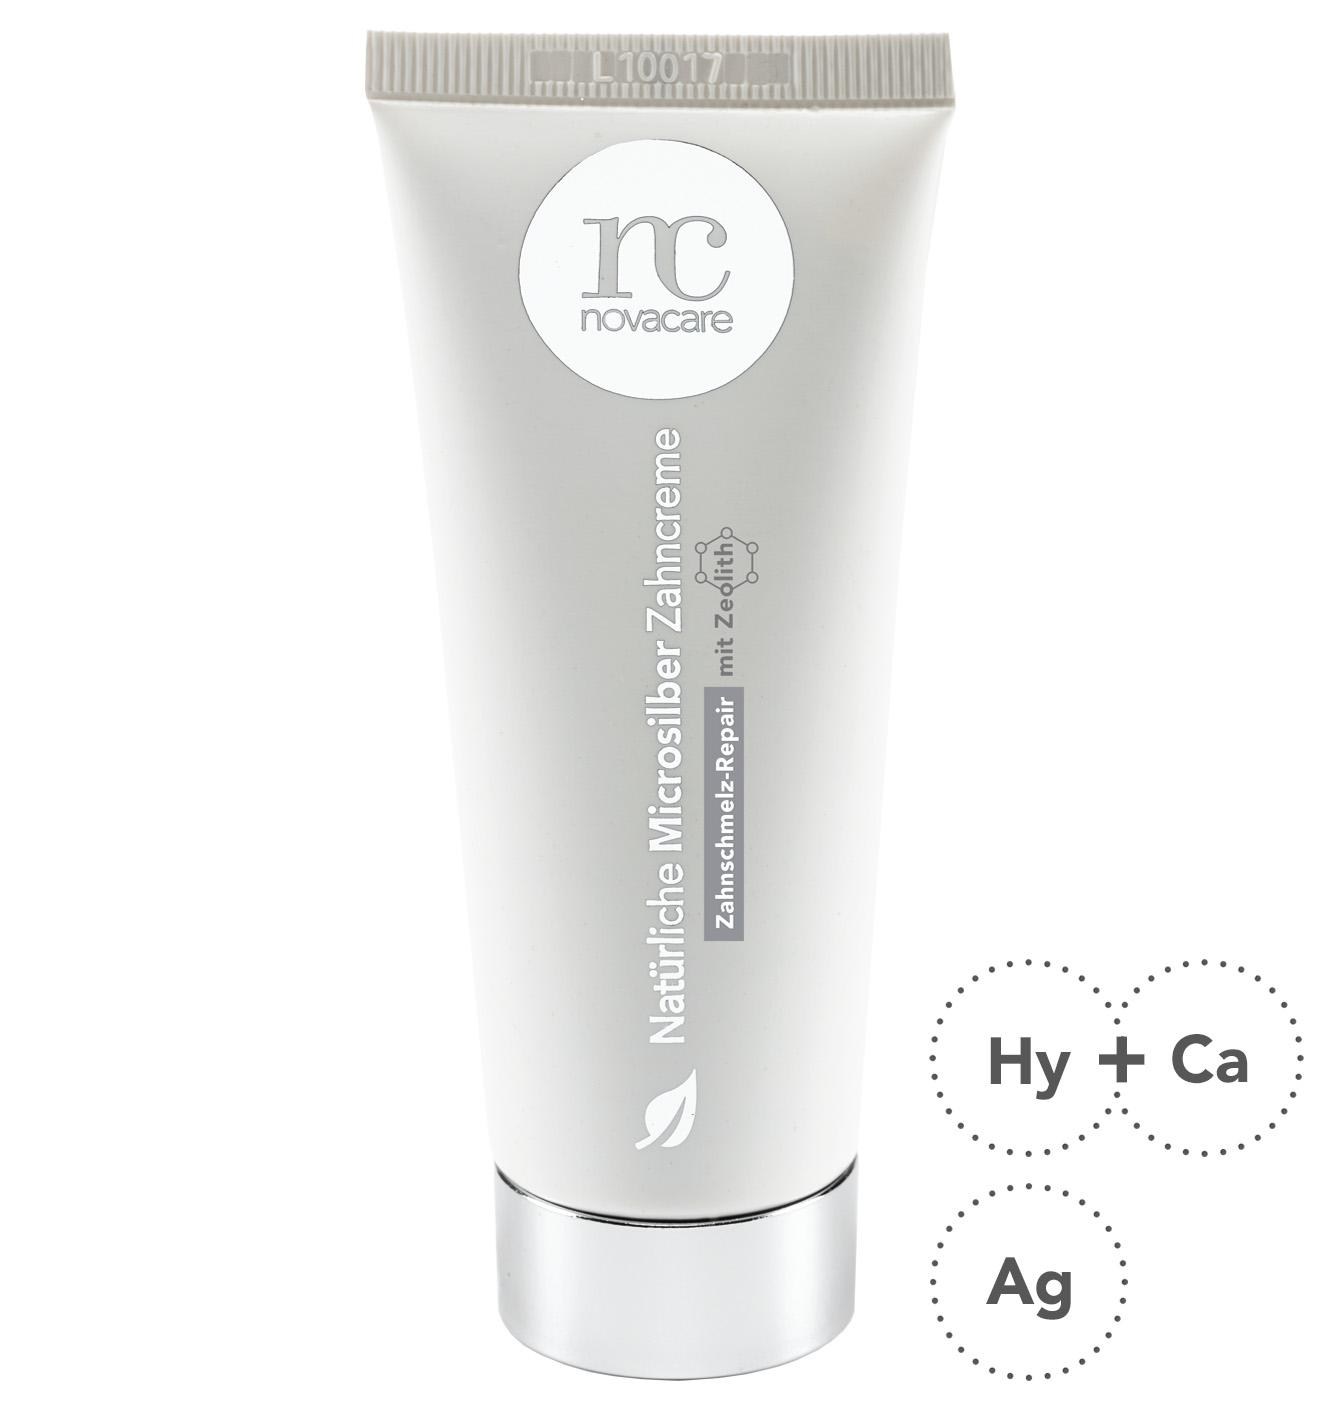 Novacare Bio Zahncreme mit Zeolith, 75 ml